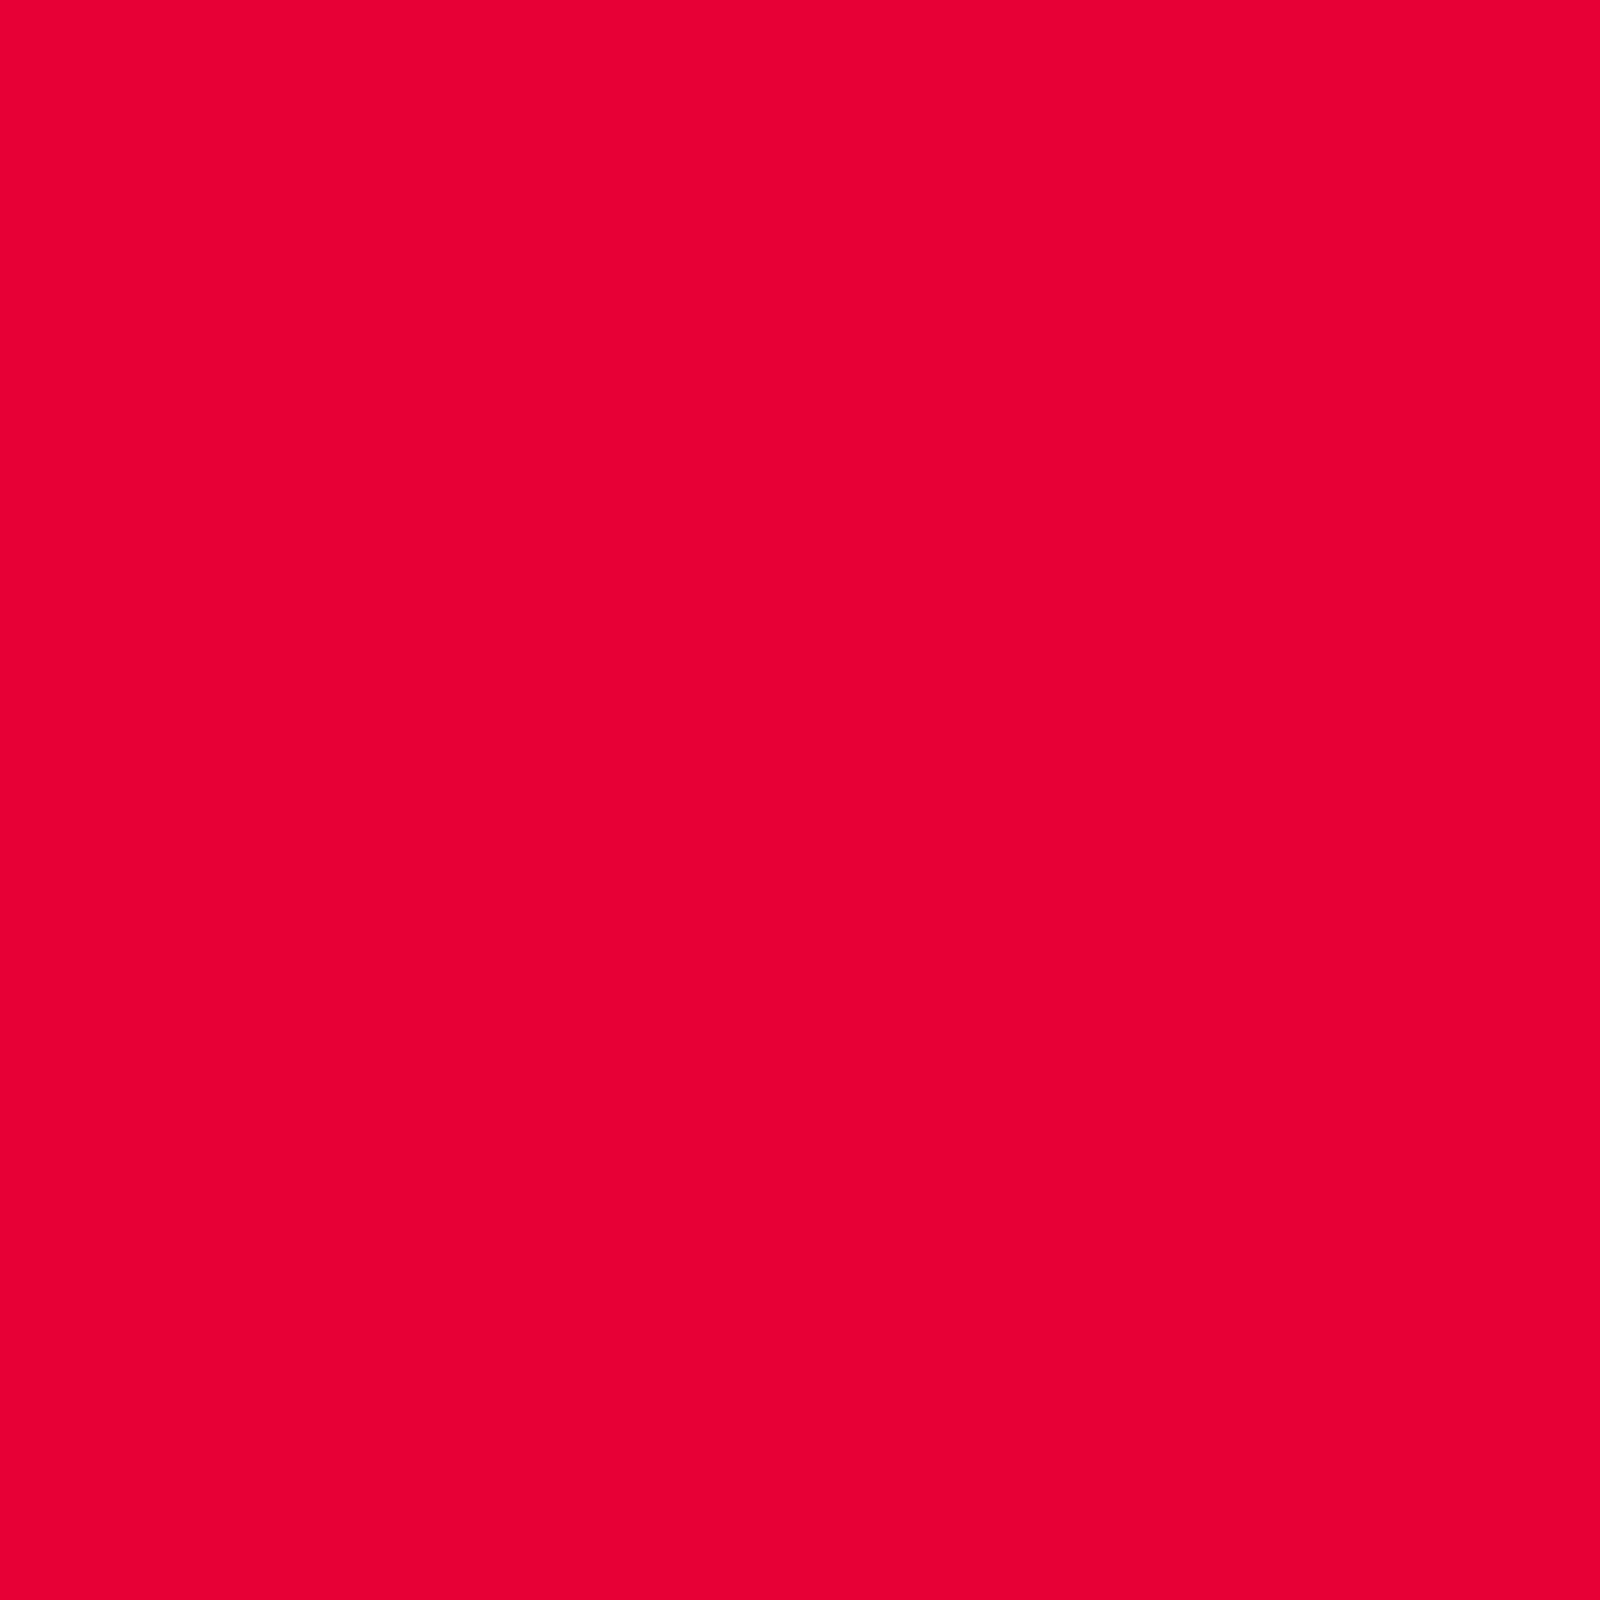 kobra rosu otrava